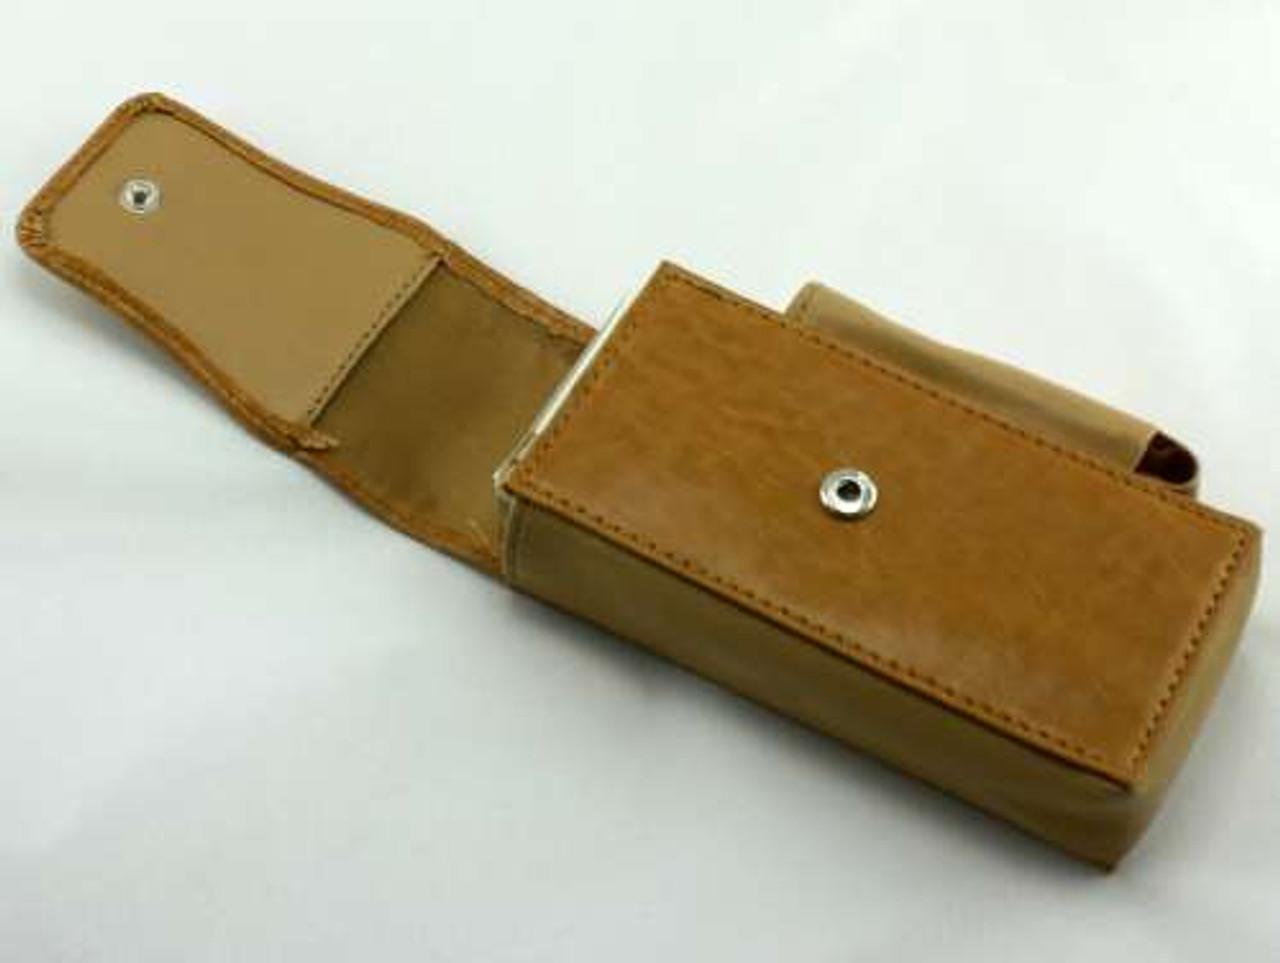 Tan Leather Cigarette Pack Holder